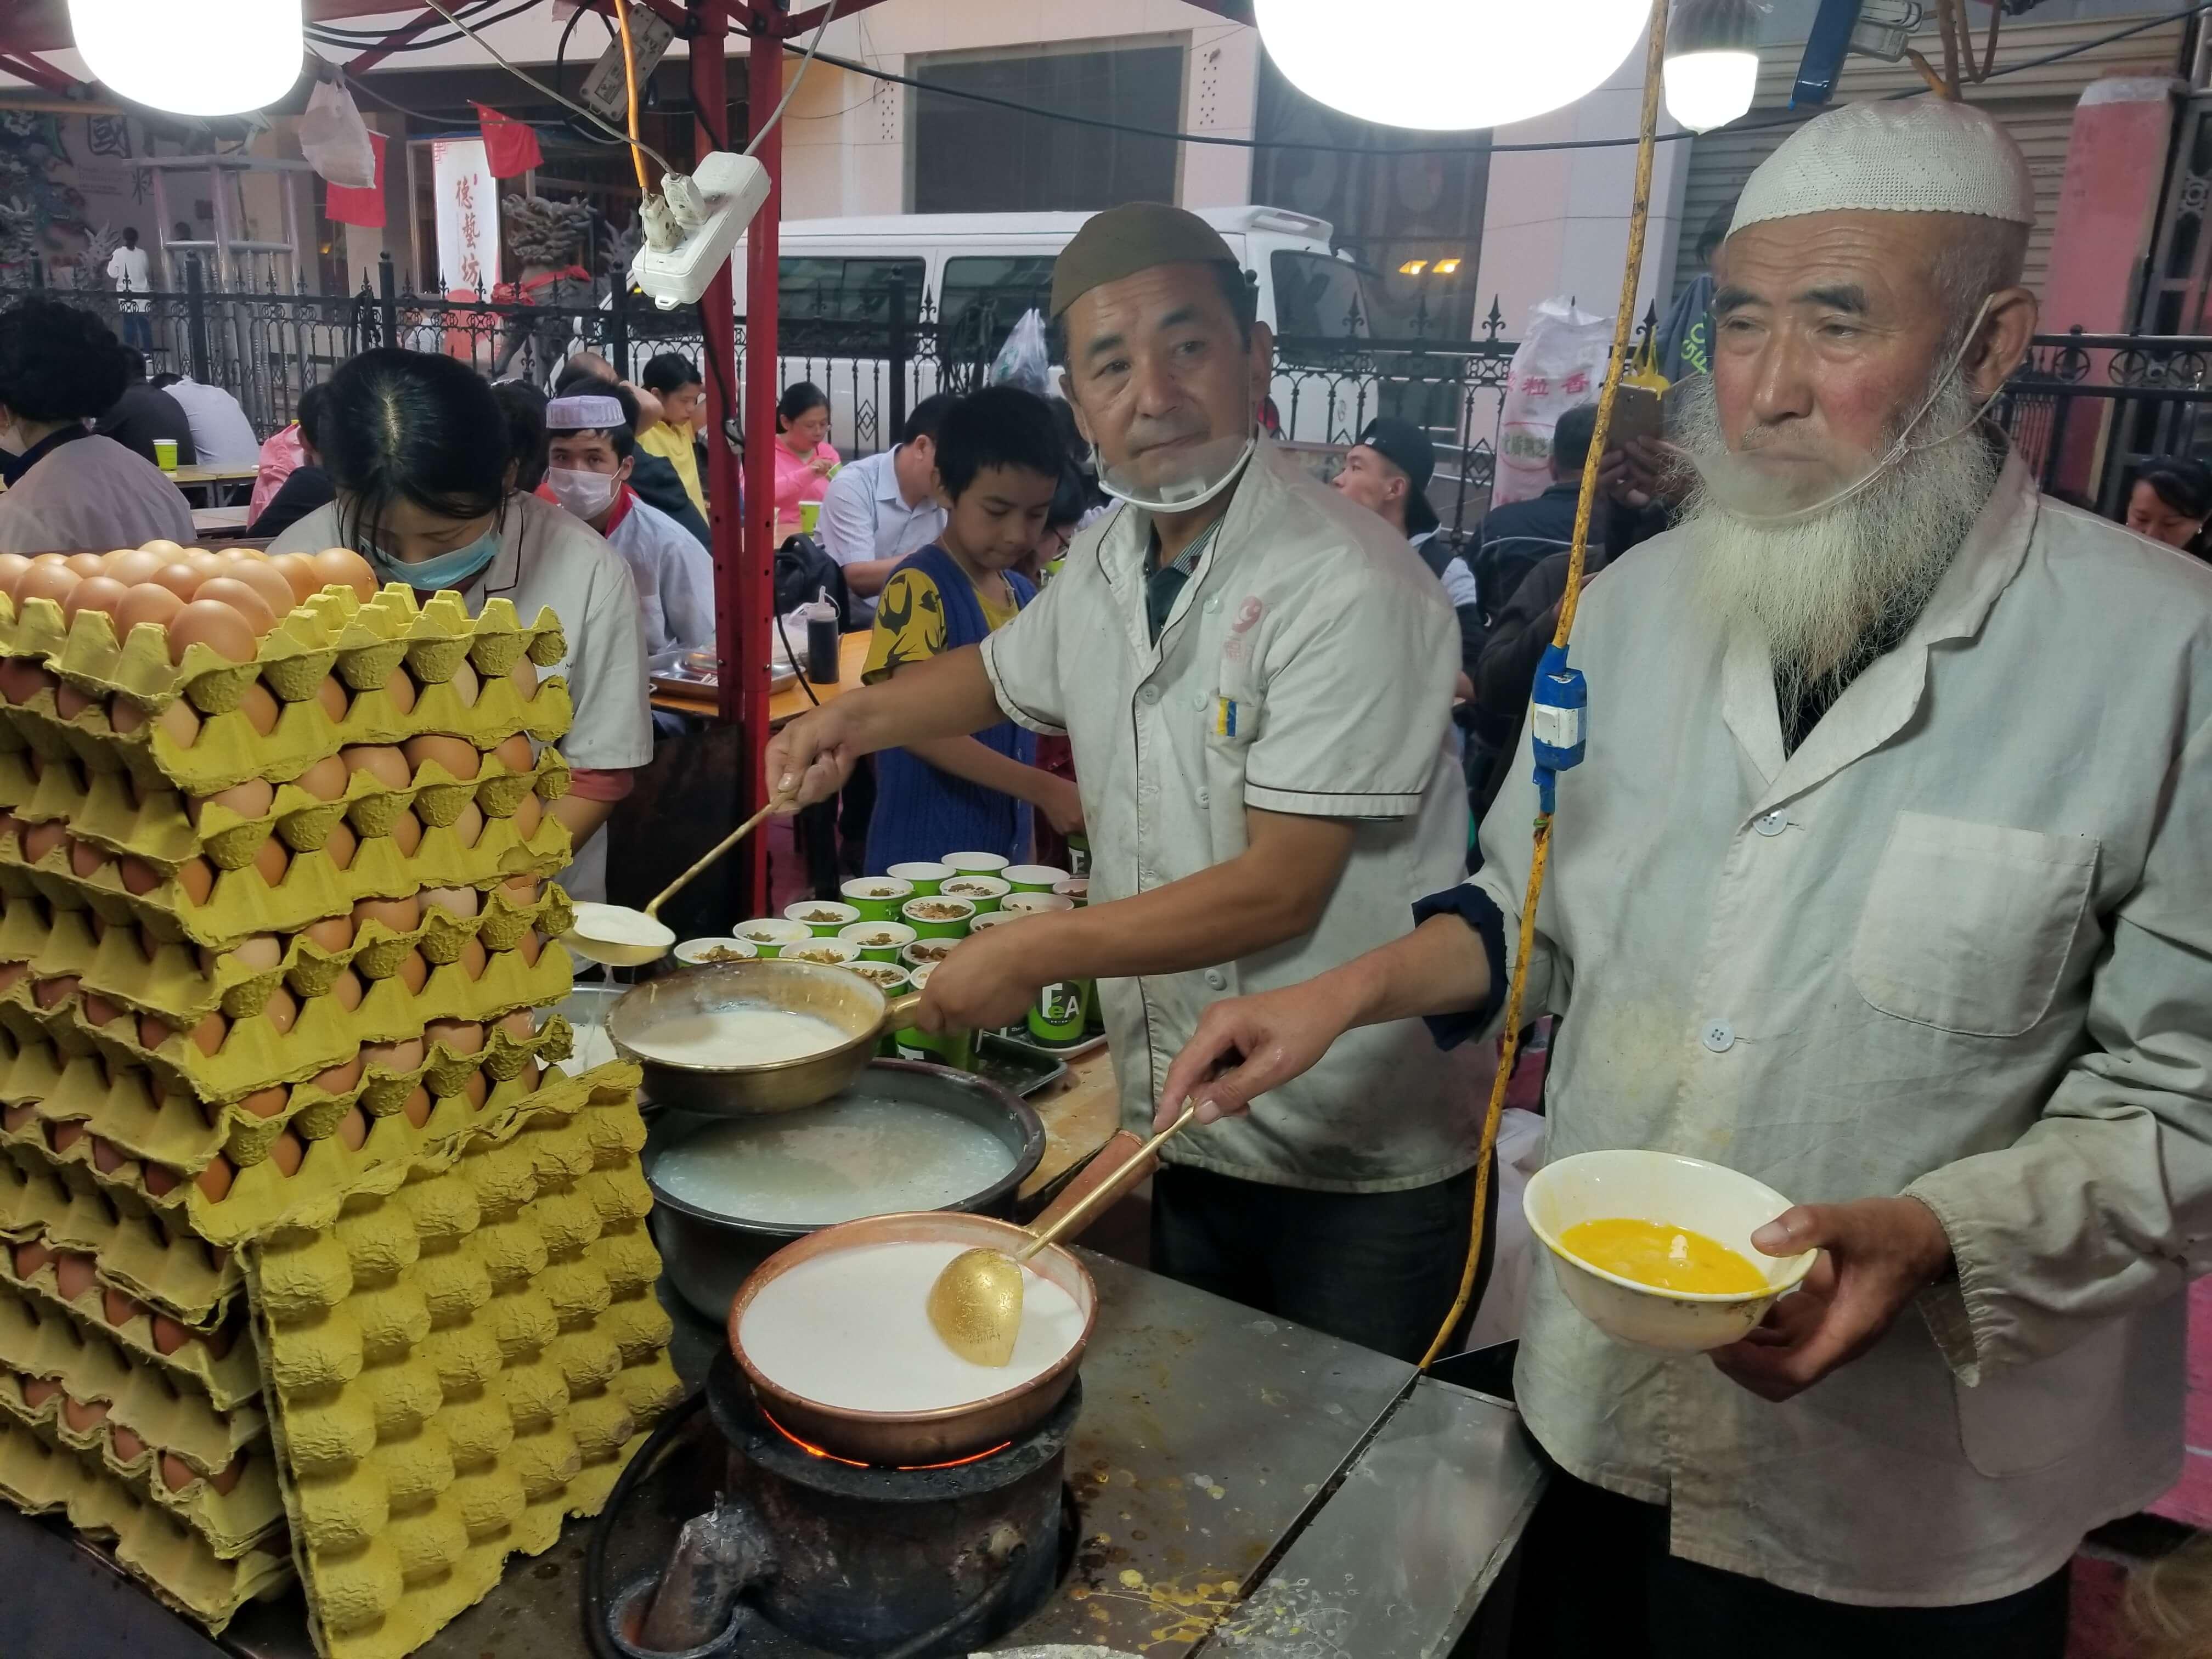 Lanzhou night market vendor